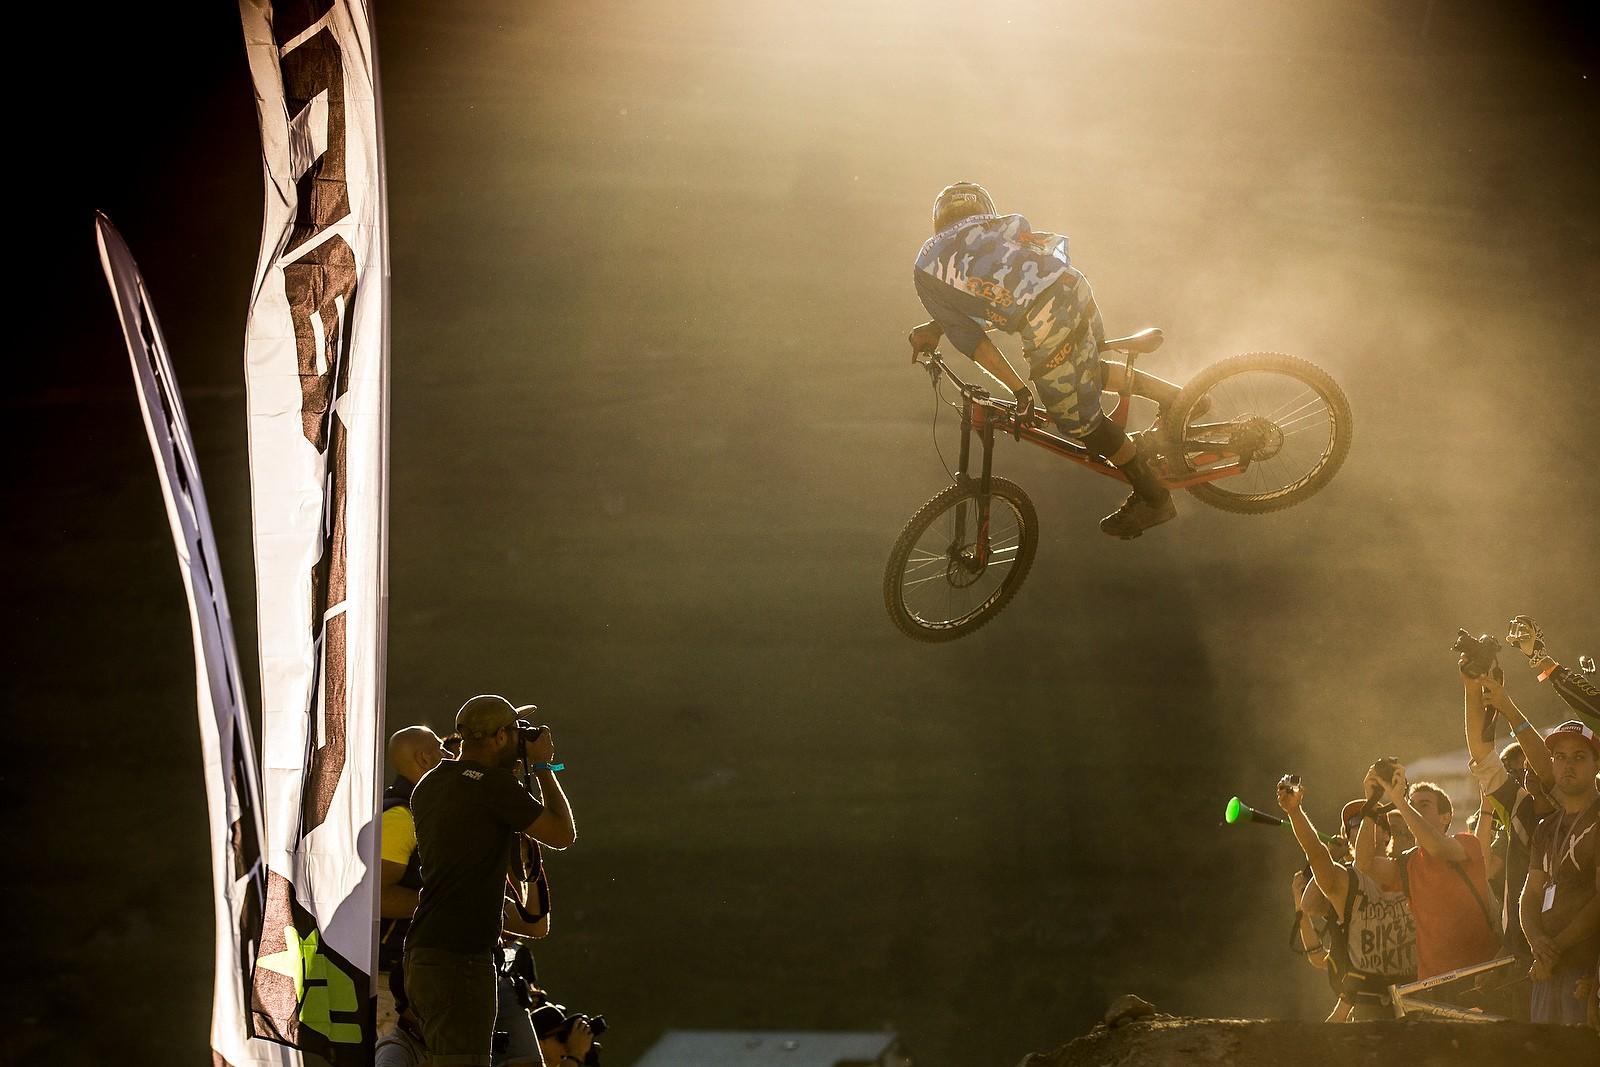 Dave McMillan, Whip Off European Champs, Crankworx L2A - Whip Off European Champs, Crankworx L2A - Mountain Biking Pictures - Vital MTB